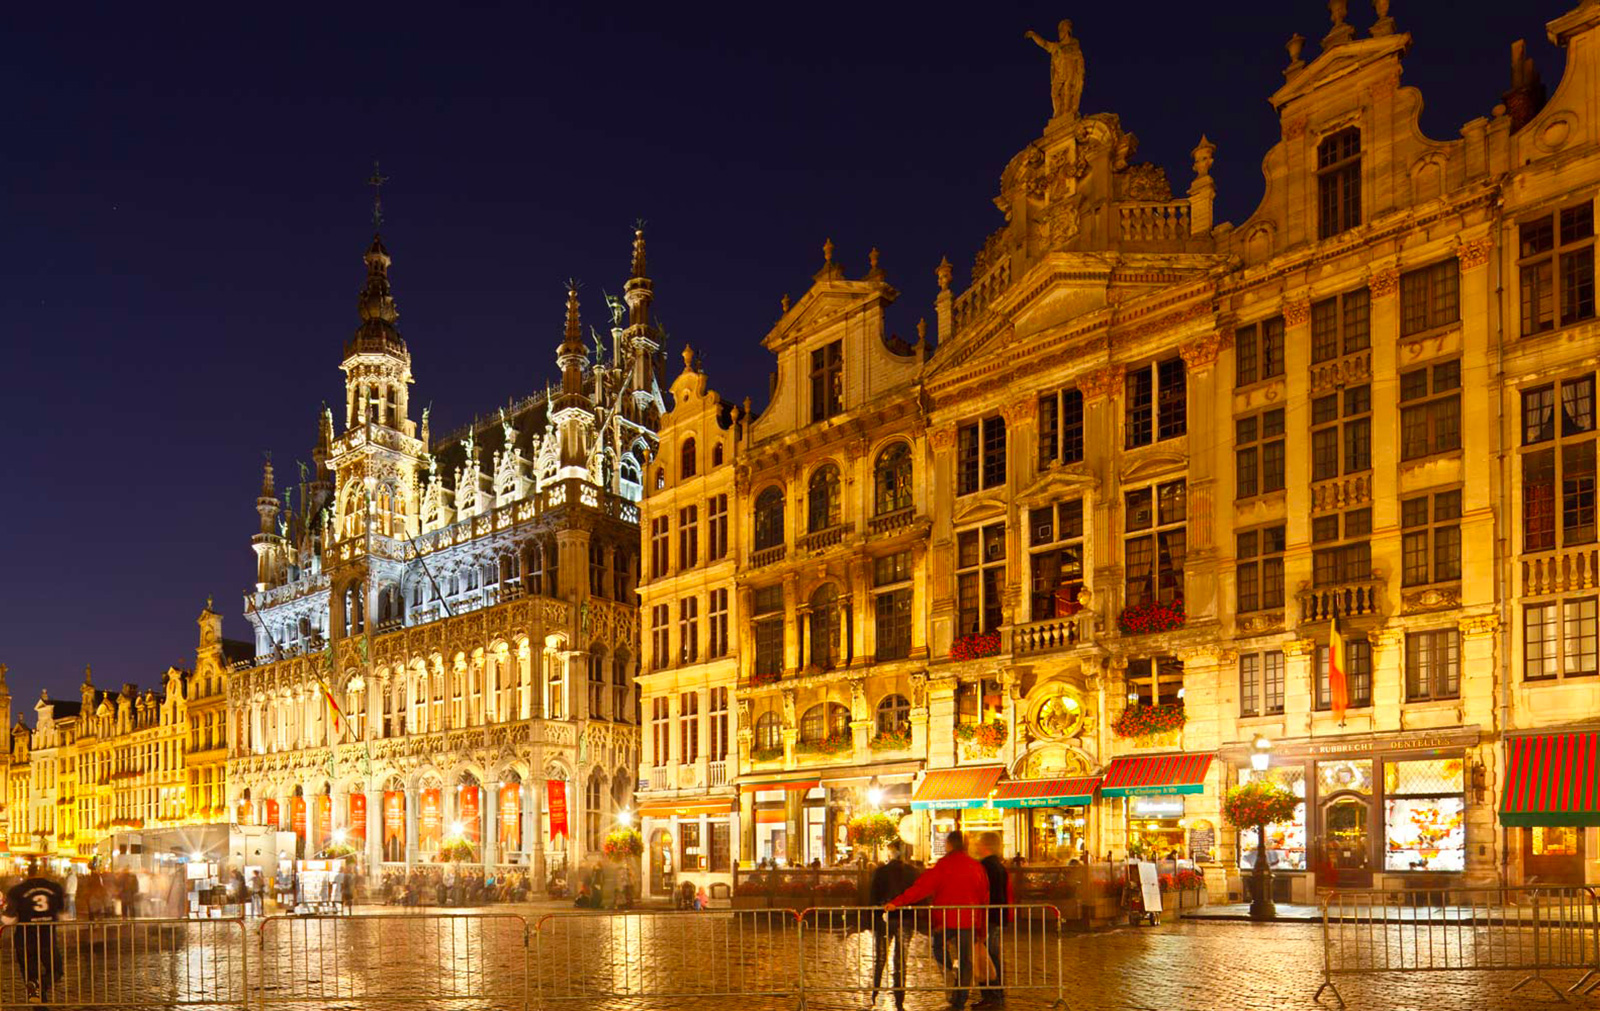 Circuits des 5 pays : Belgique Hollande Allemagne Luxembourg France